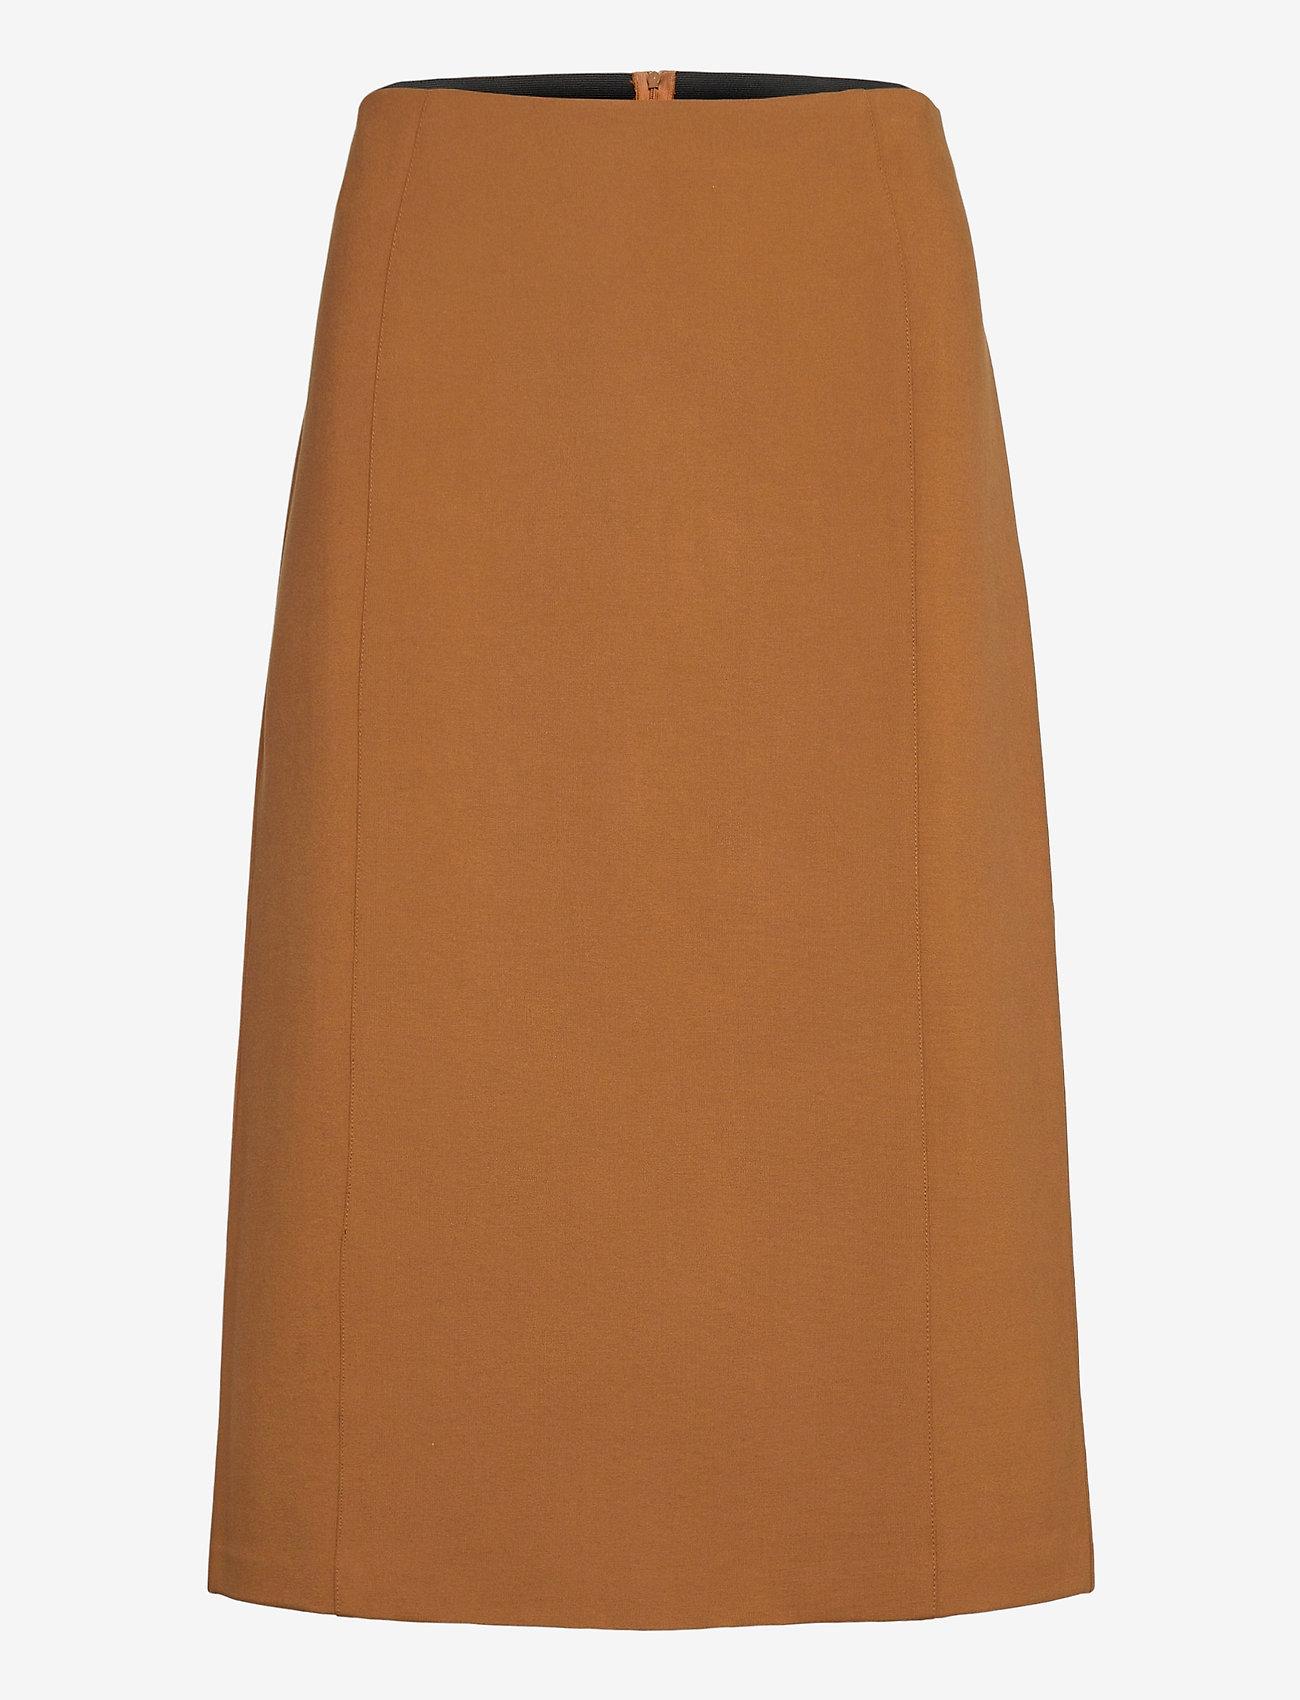 SAND - 2548 - Malhia Skirt - midi skirts - light camel - 0